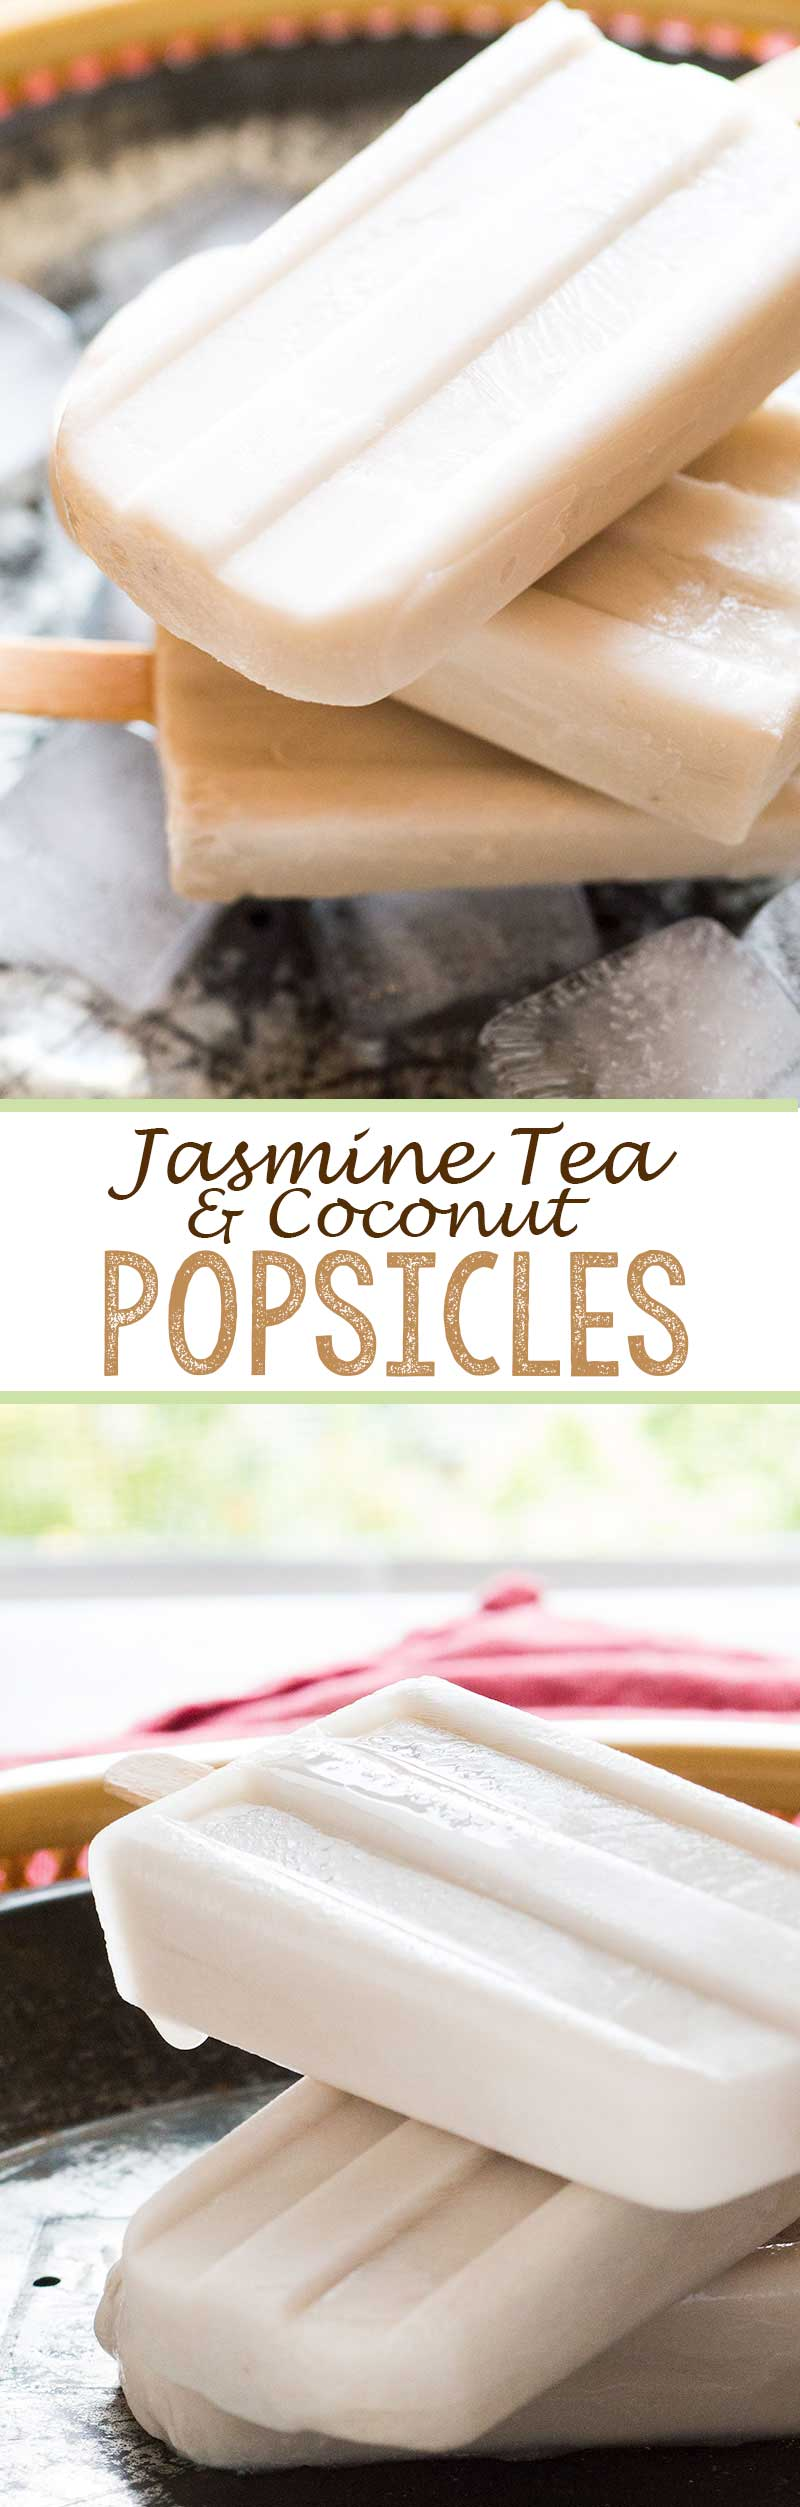 jasmine tea and coconut popsicles